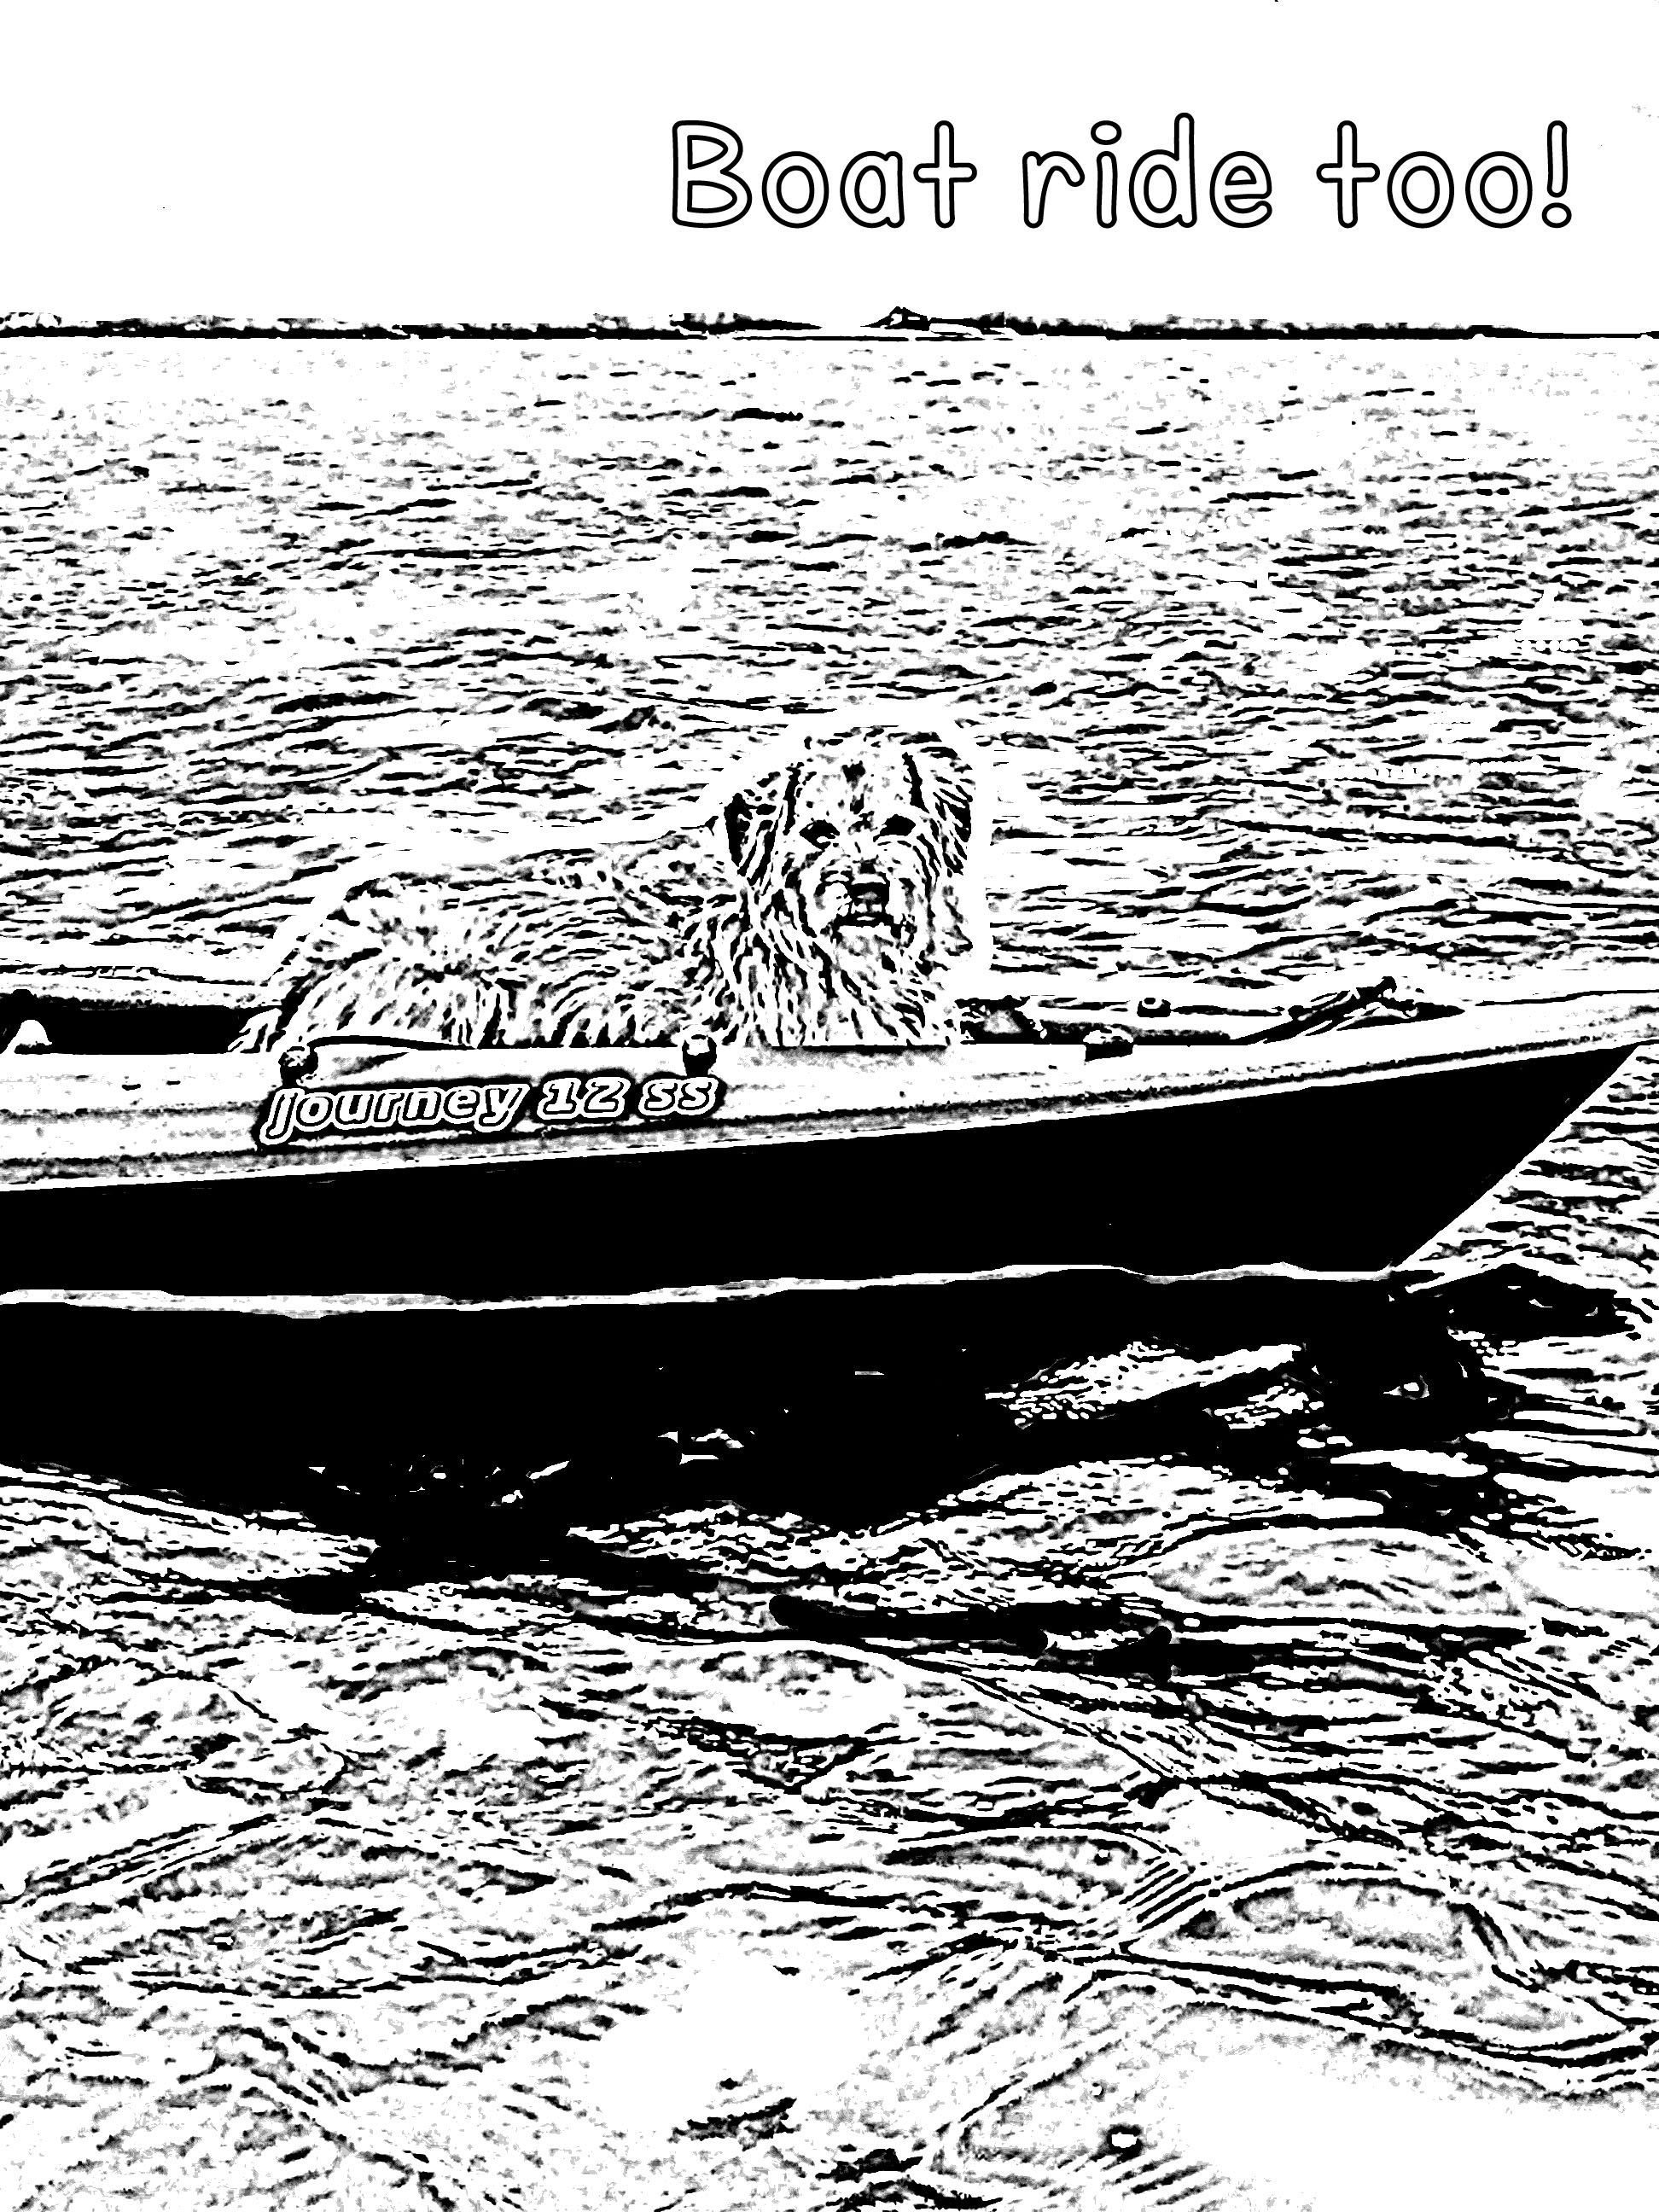 18.kodin boat.jpg